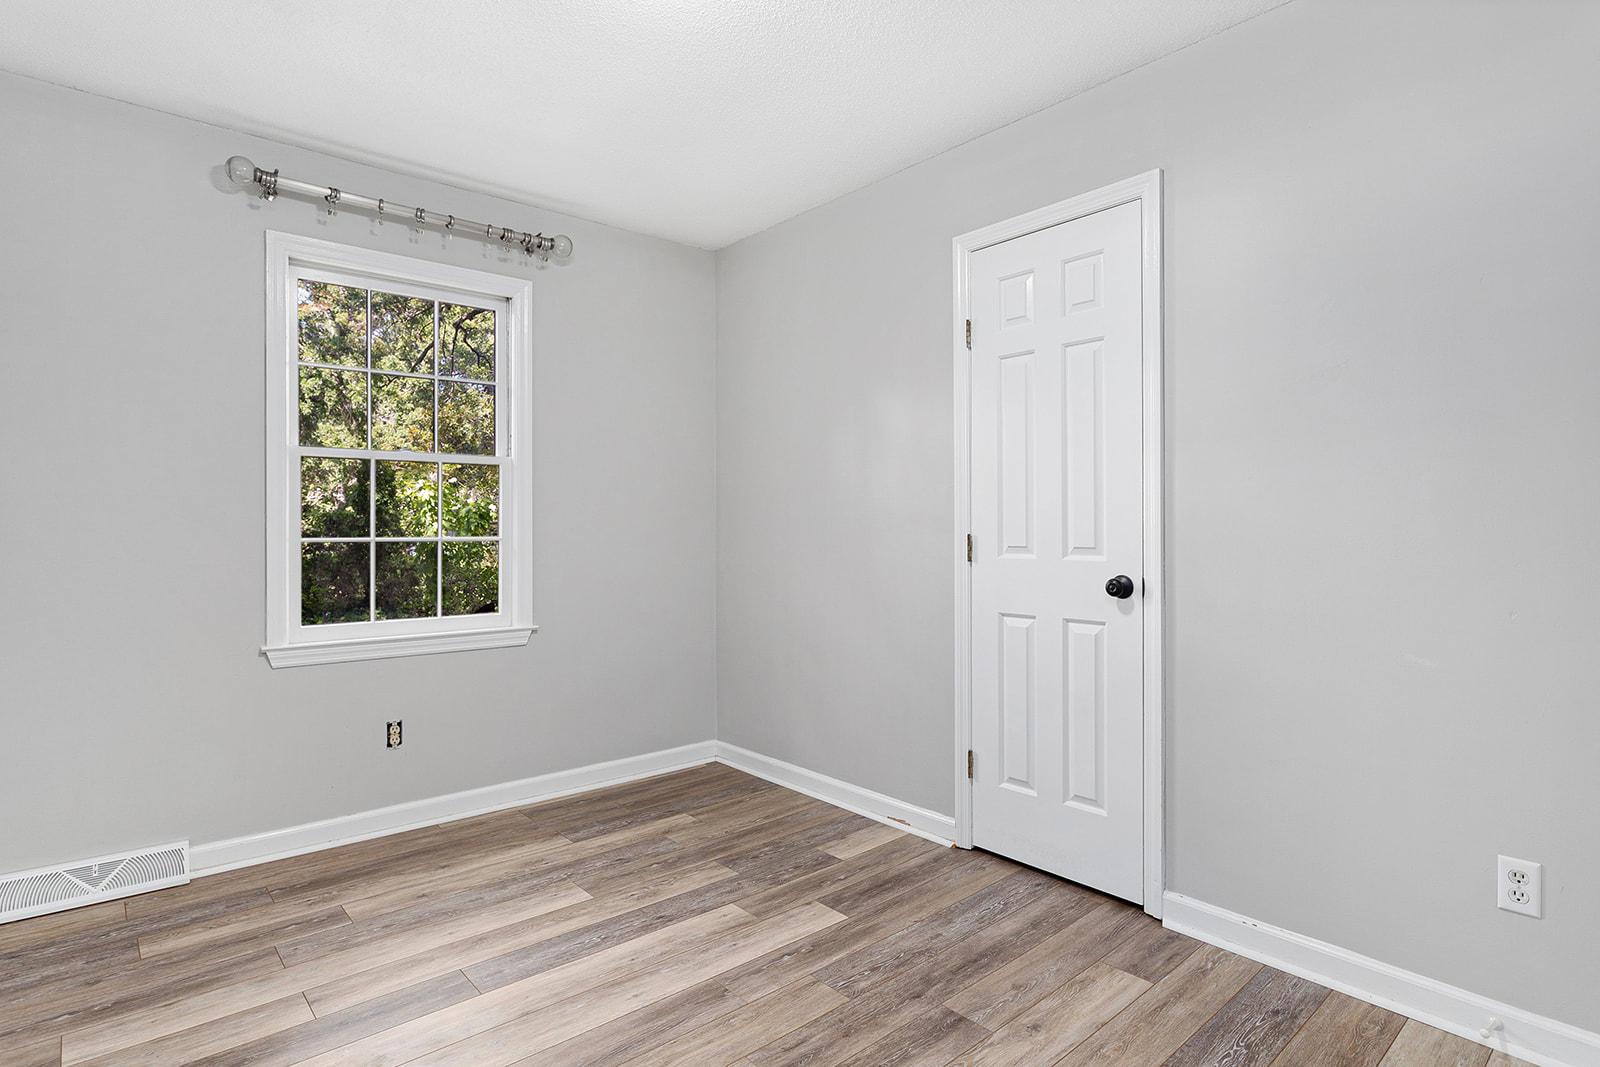 Shemwood II Homes For Sale - 954 Sea Gull, Mount Pleasant, SC - 17